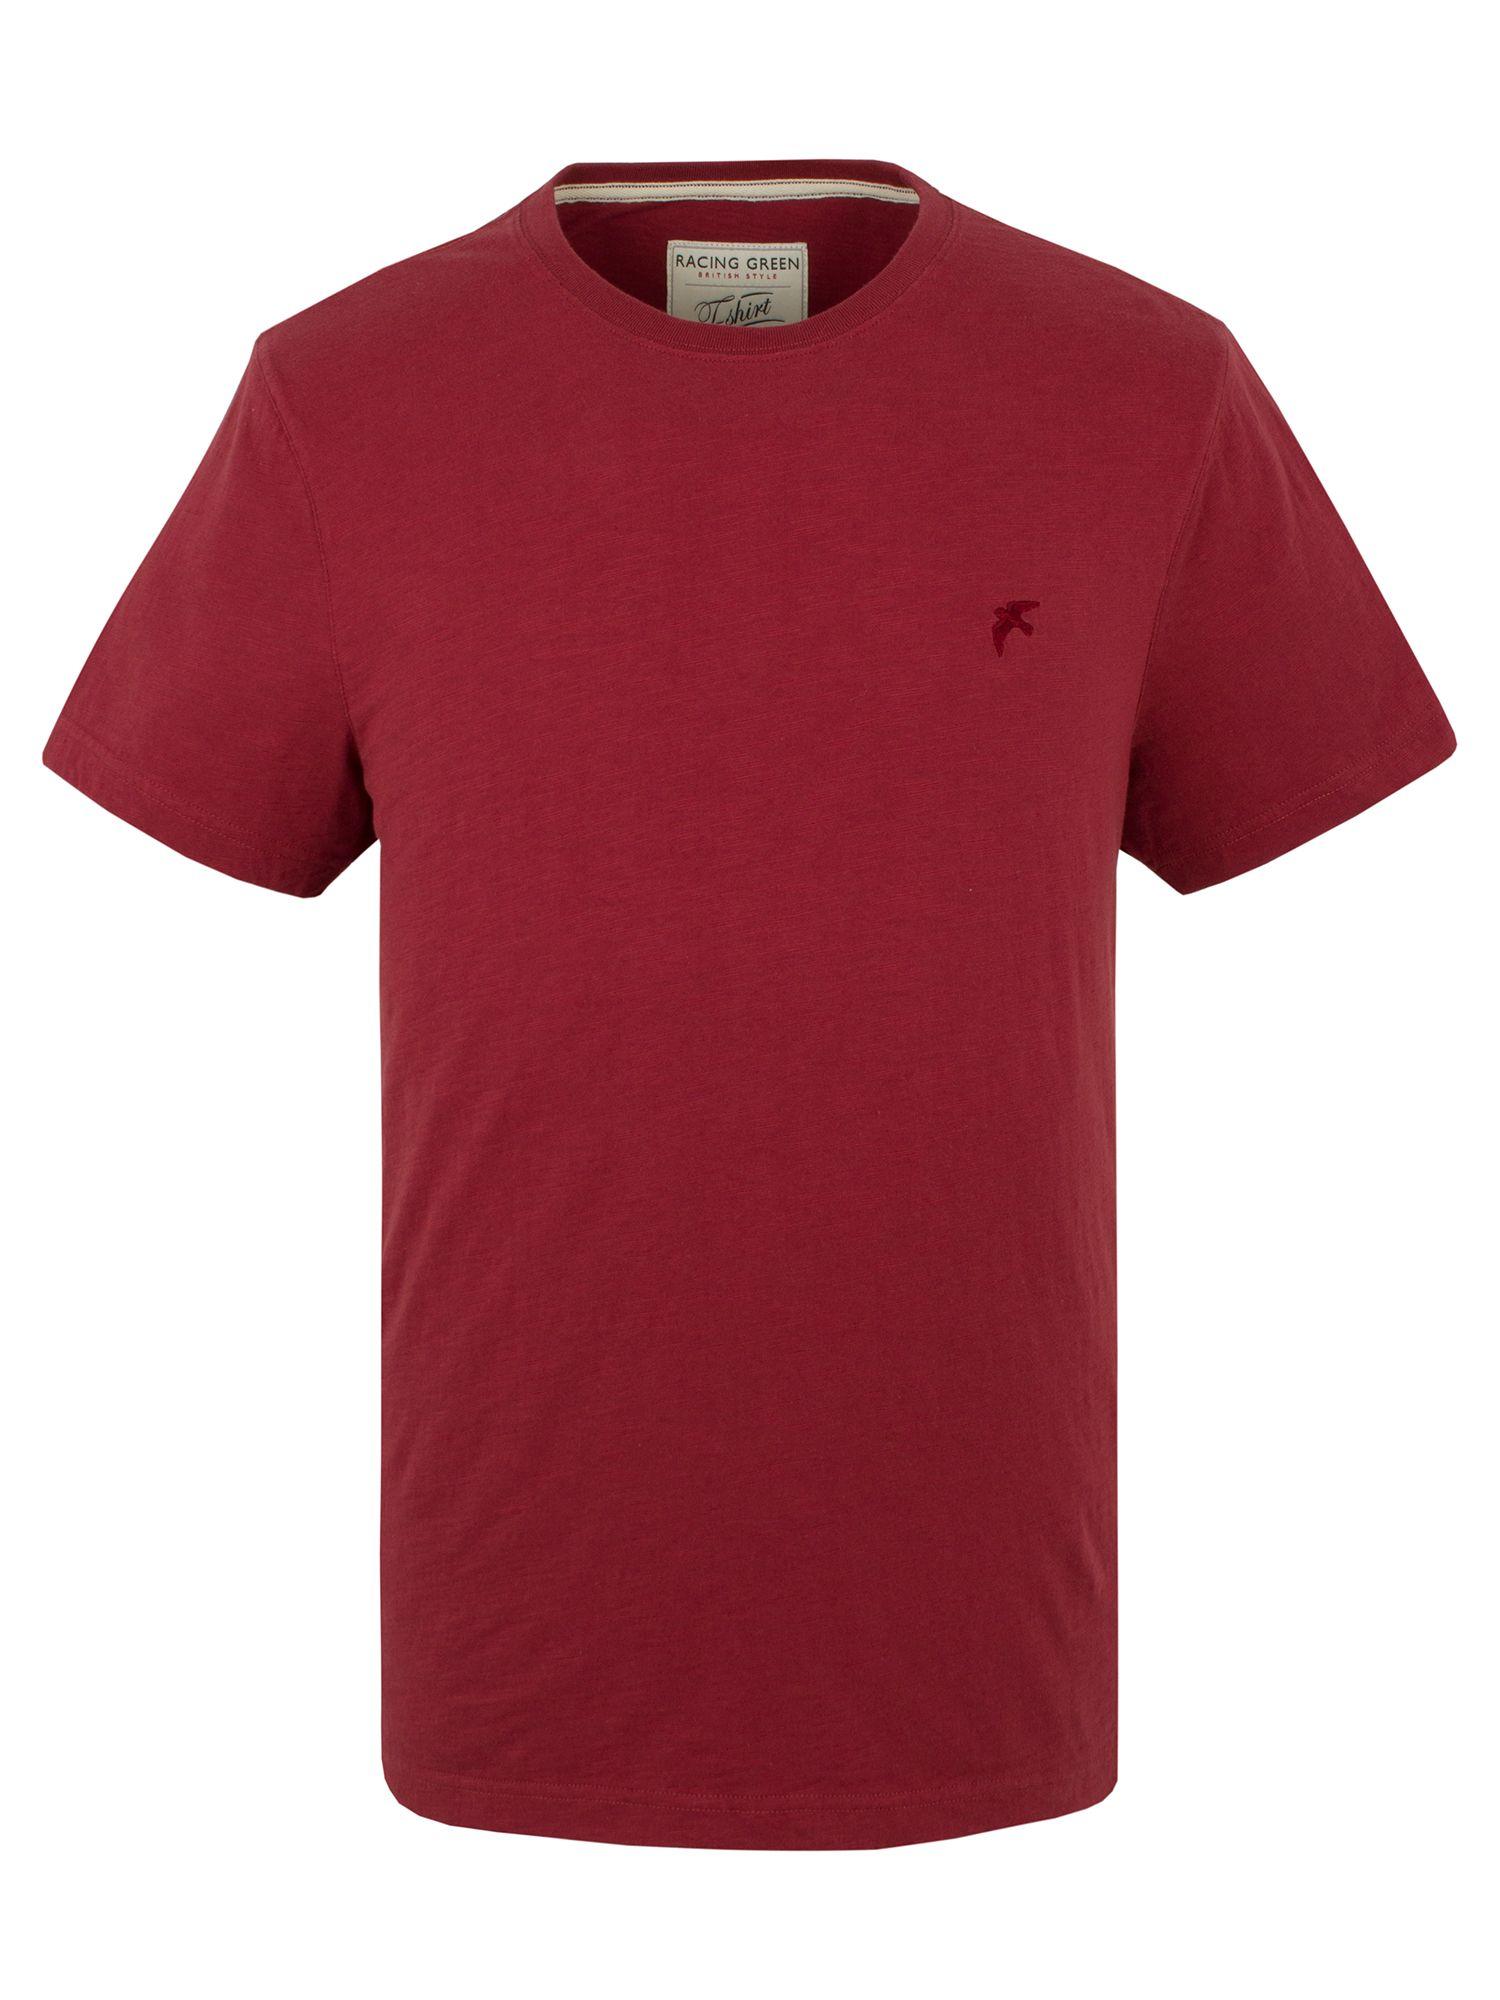 Racing green plain slub t shirt in red for men lyst for What is a slub shirt